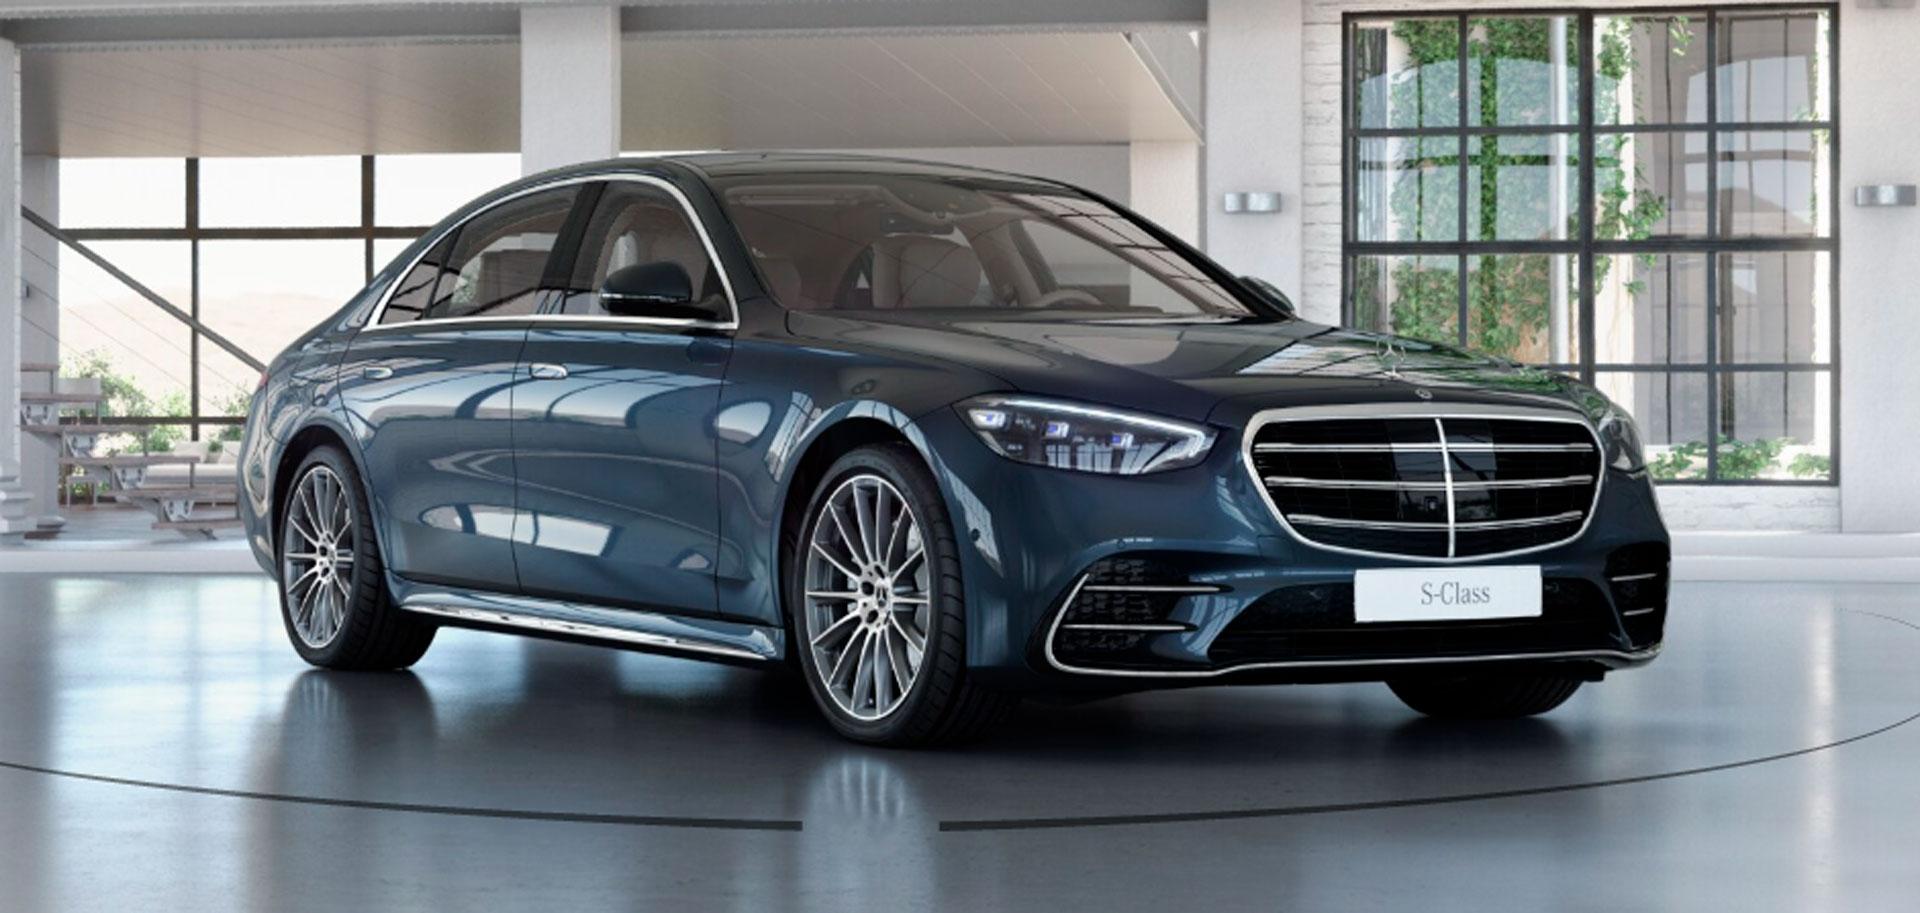 Mercedes-Benz S-Class Limousine 0152601250